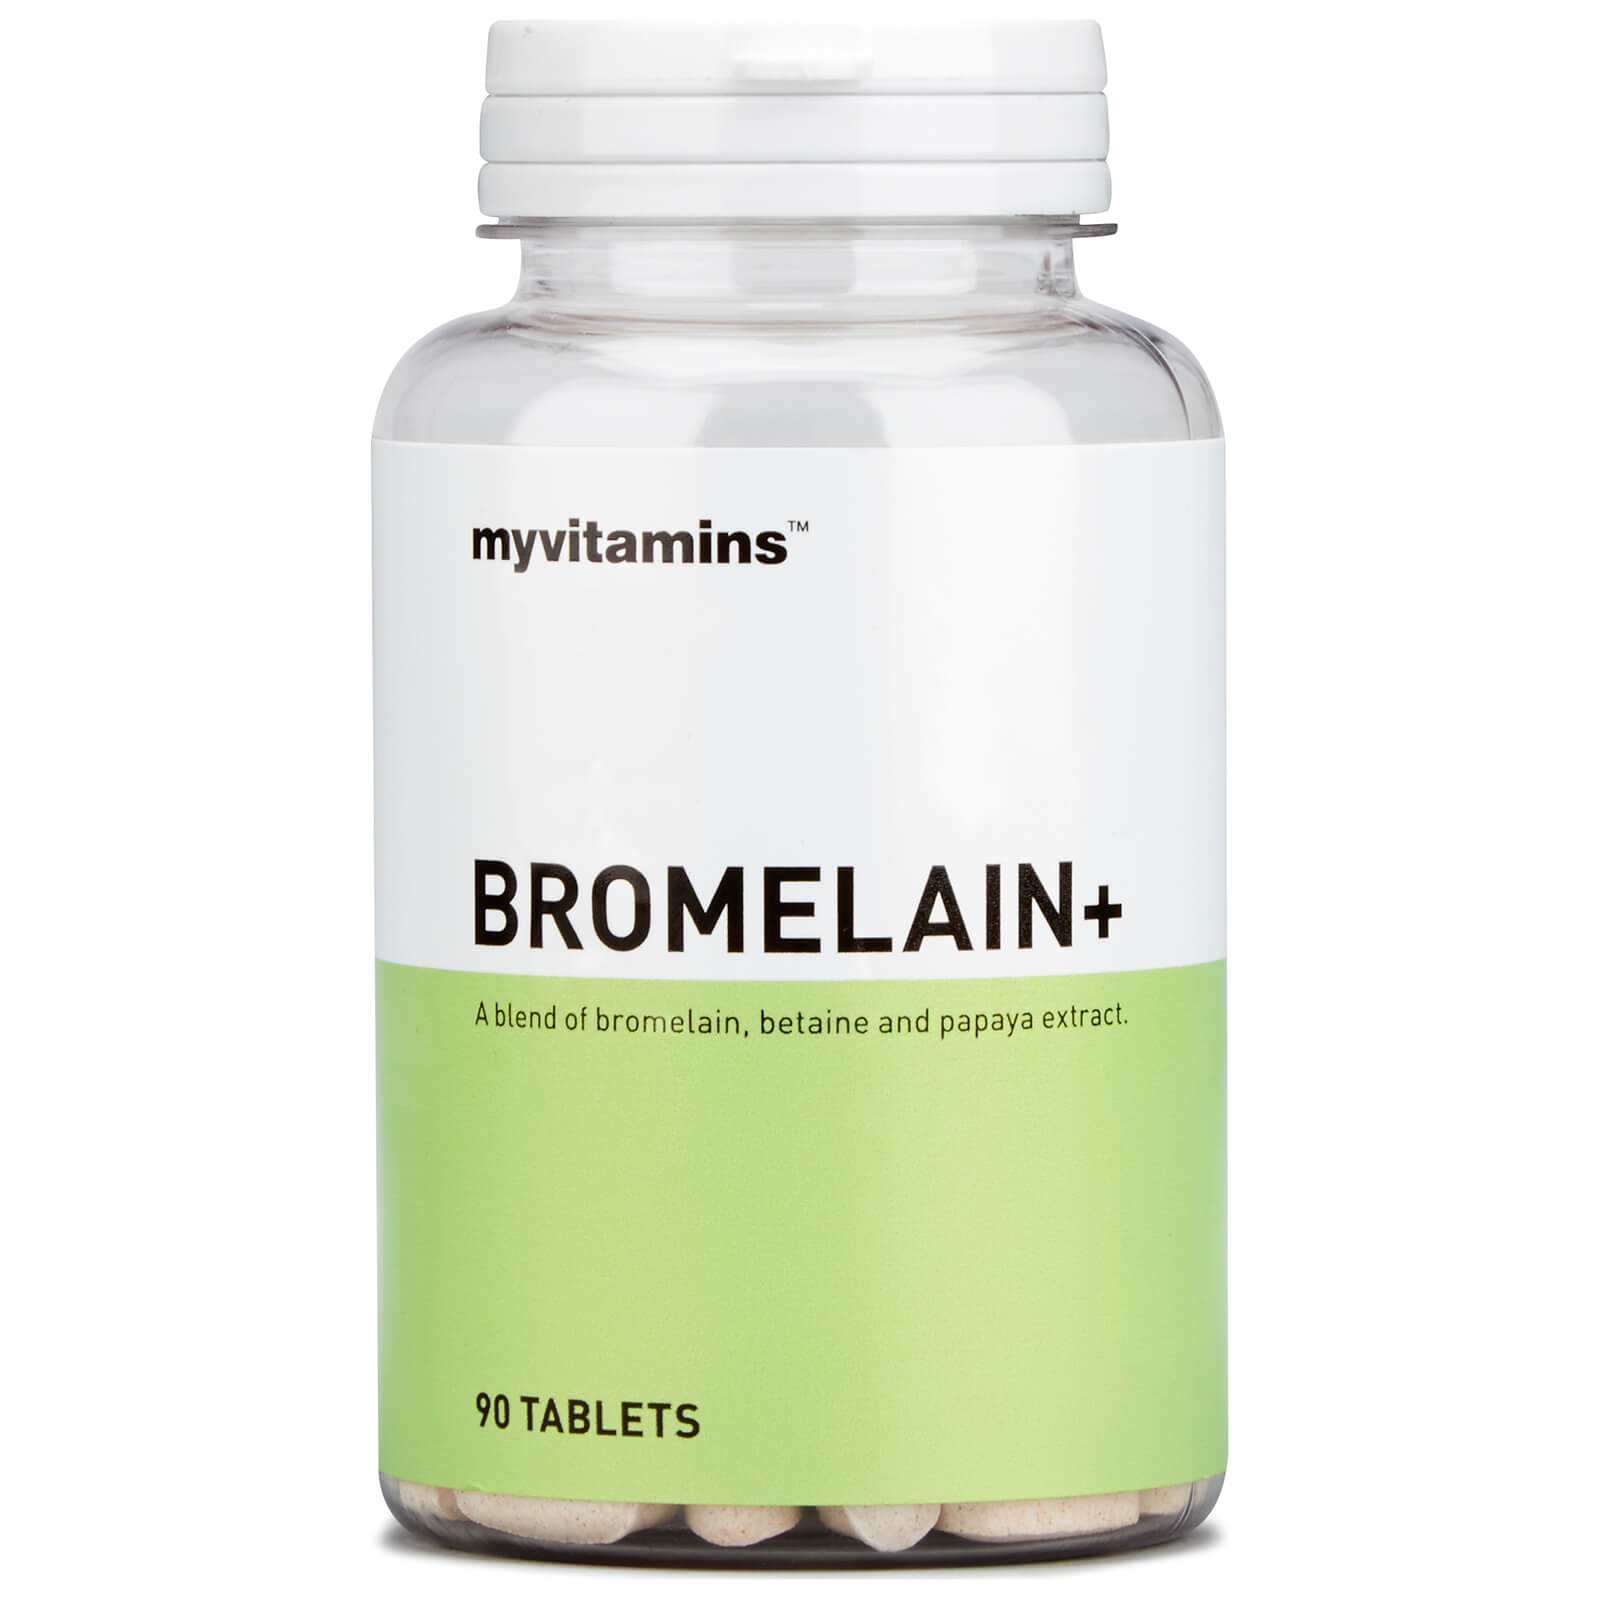 Image of Bromelain+ (30 Tablets) - Myvitamins 5056104500798